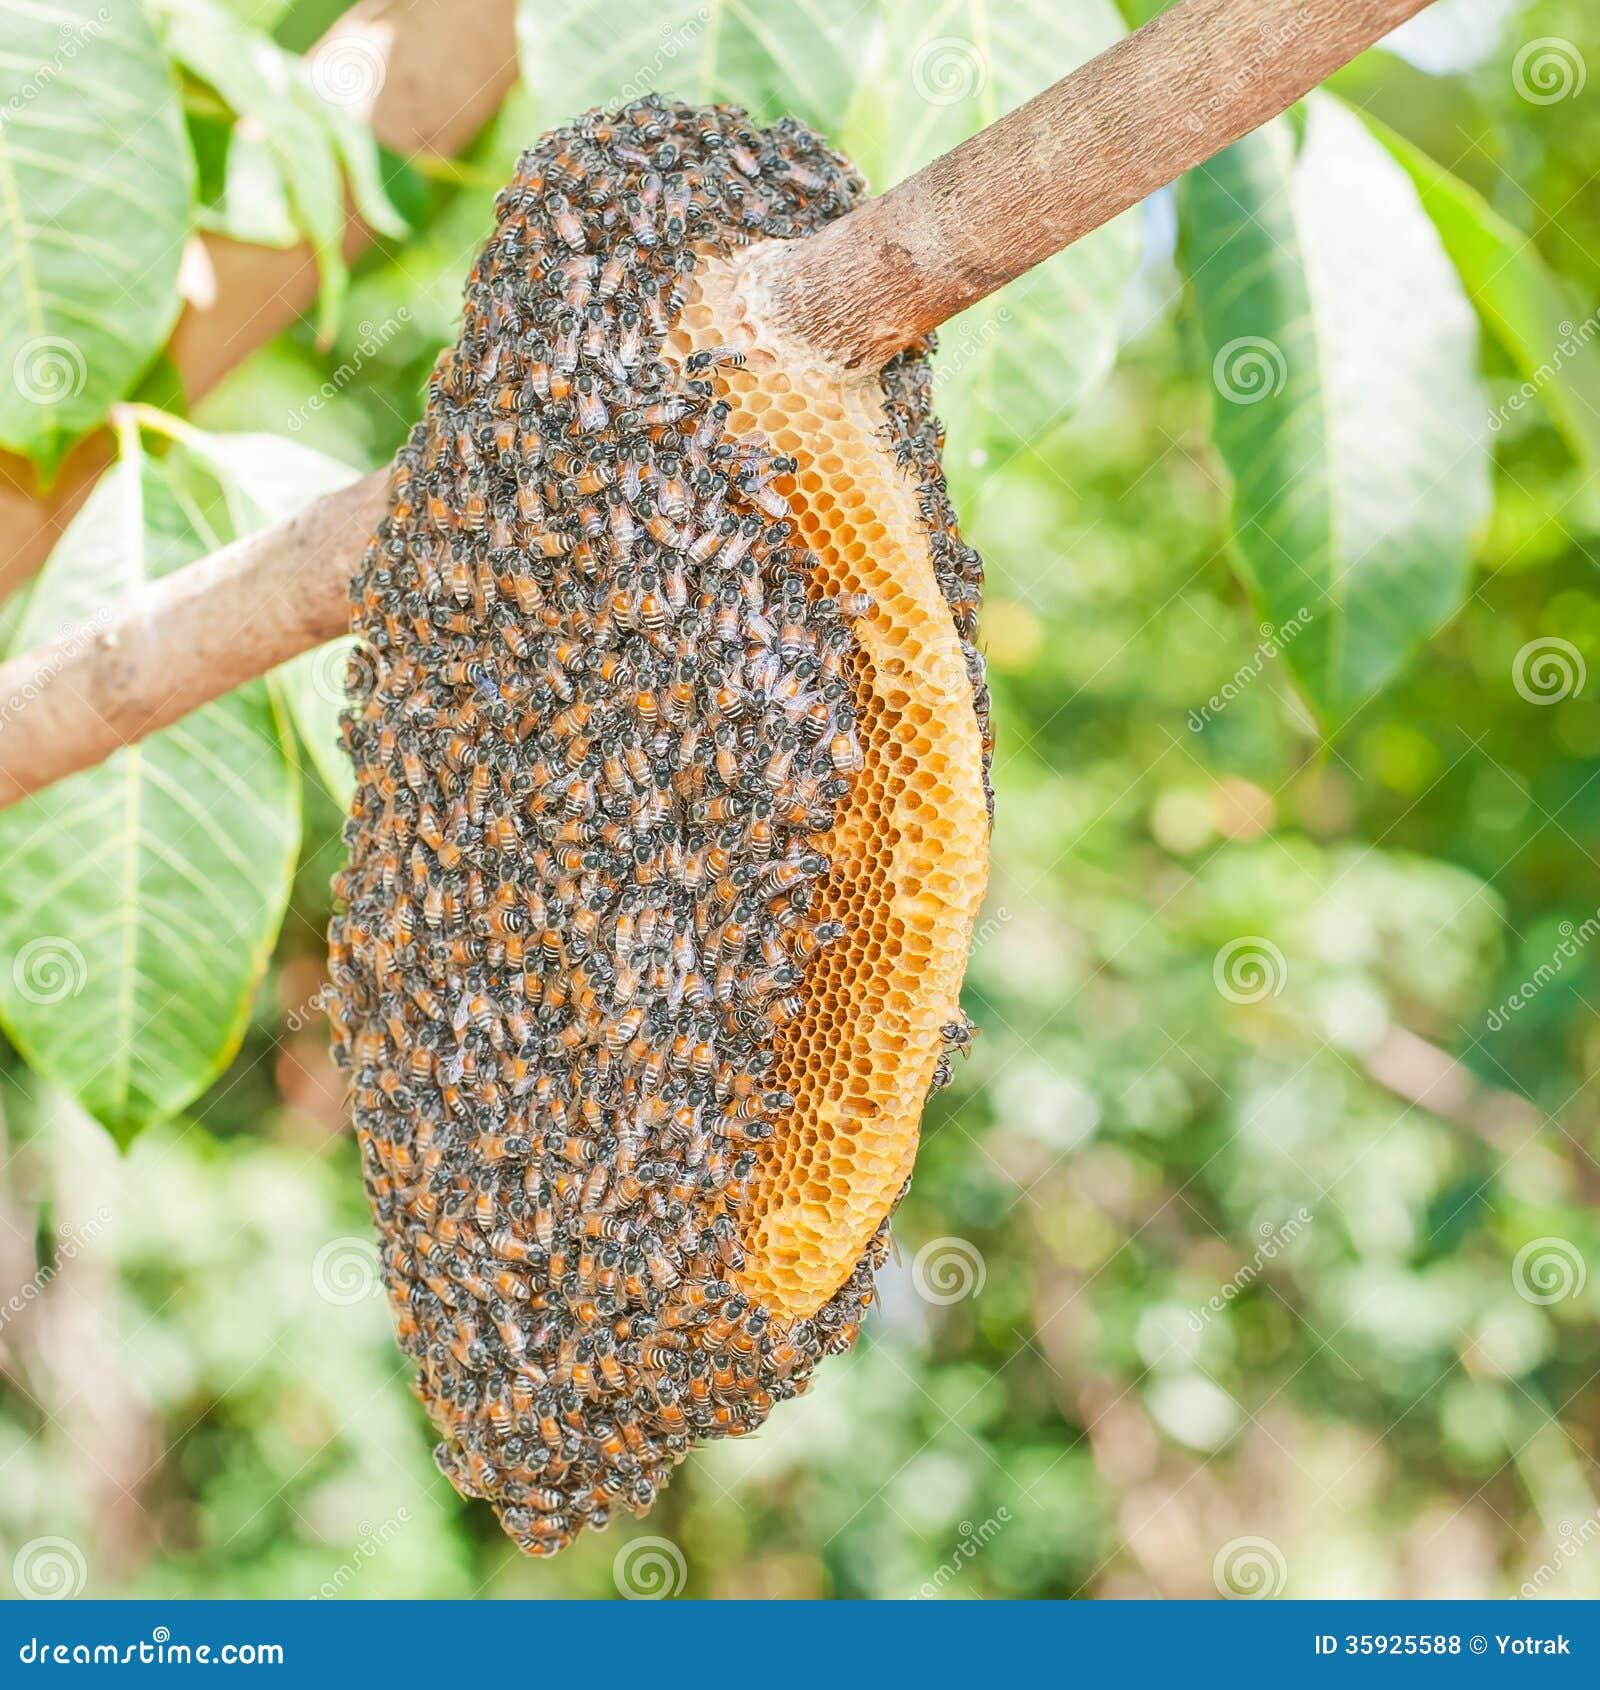 Honeybee Swarm Royalty Free Stock Photos - Image: 35925588